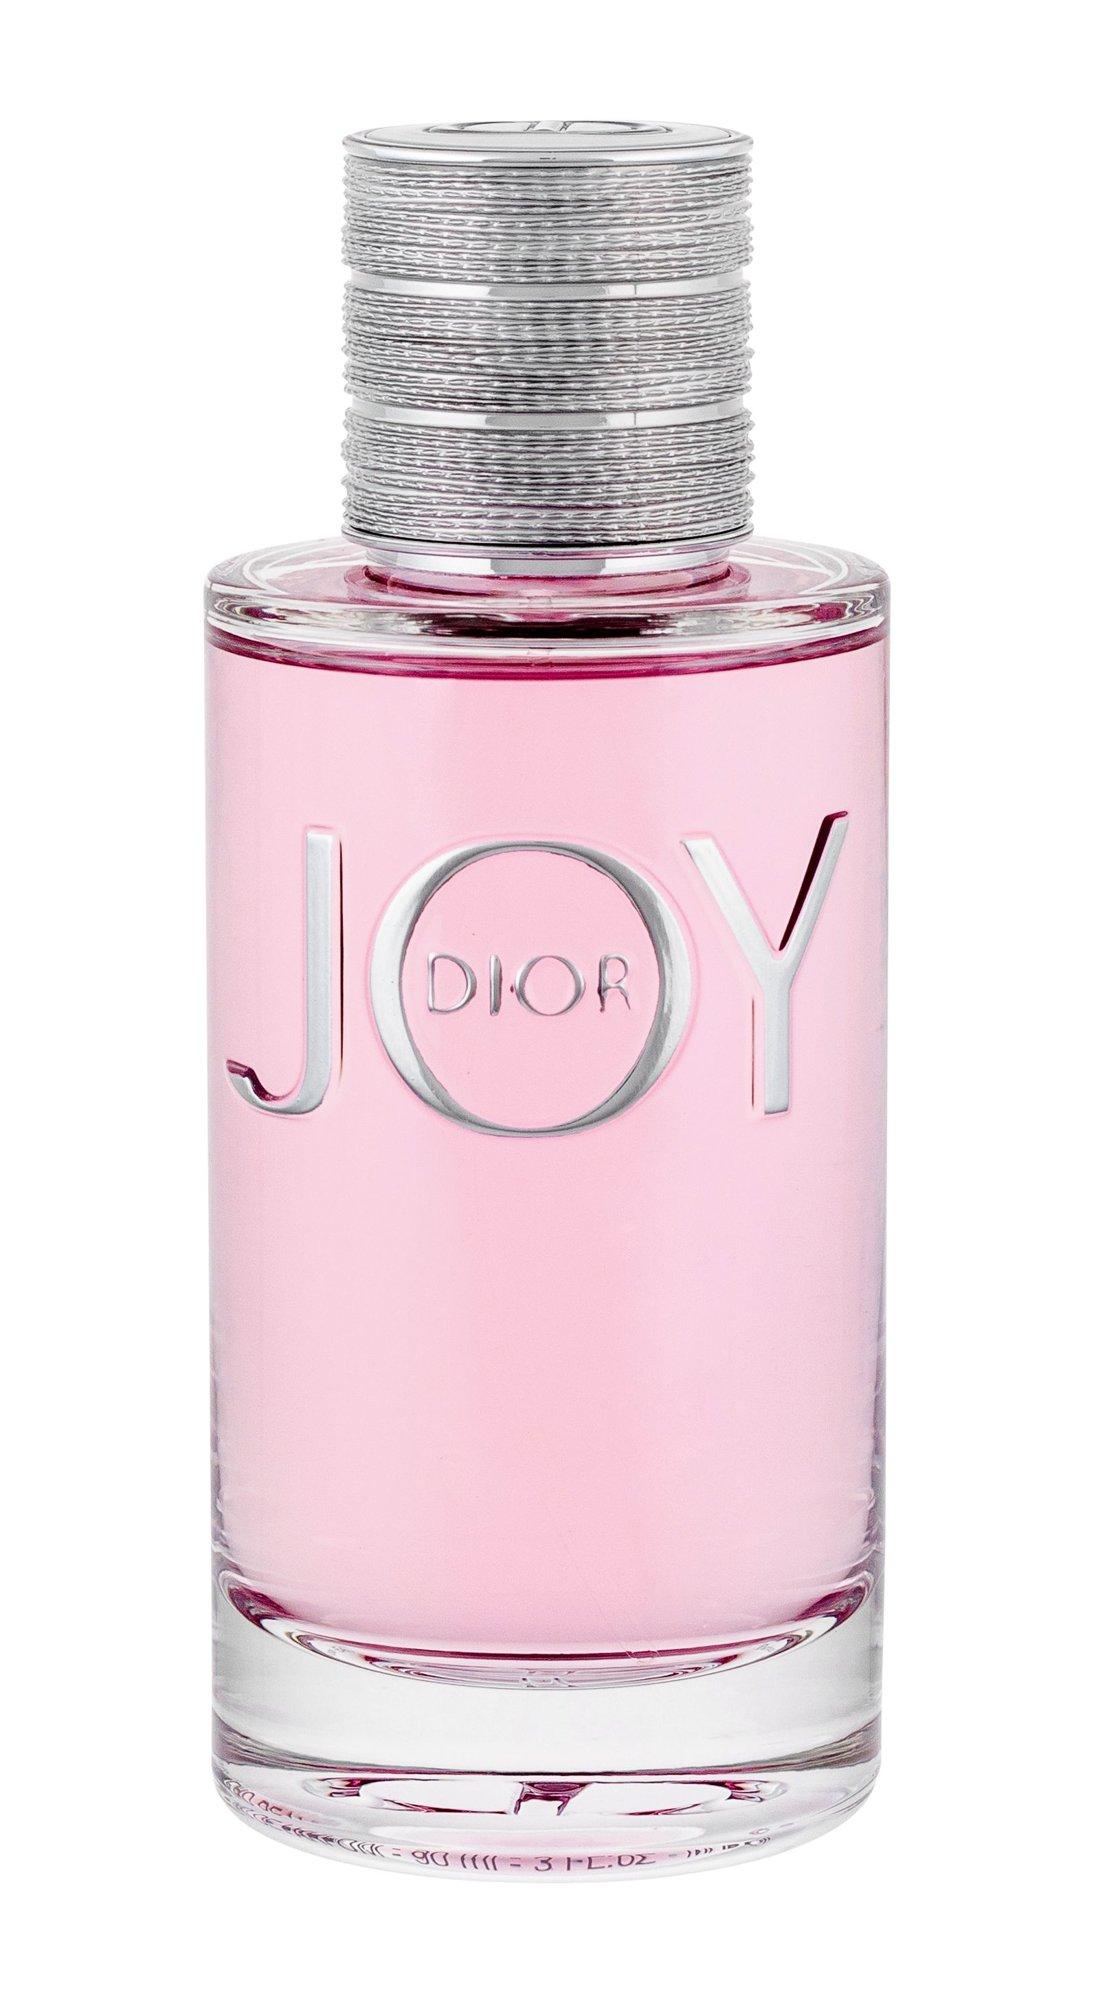 Christian Dior Joy by Dior Eau de Parfum 90ml